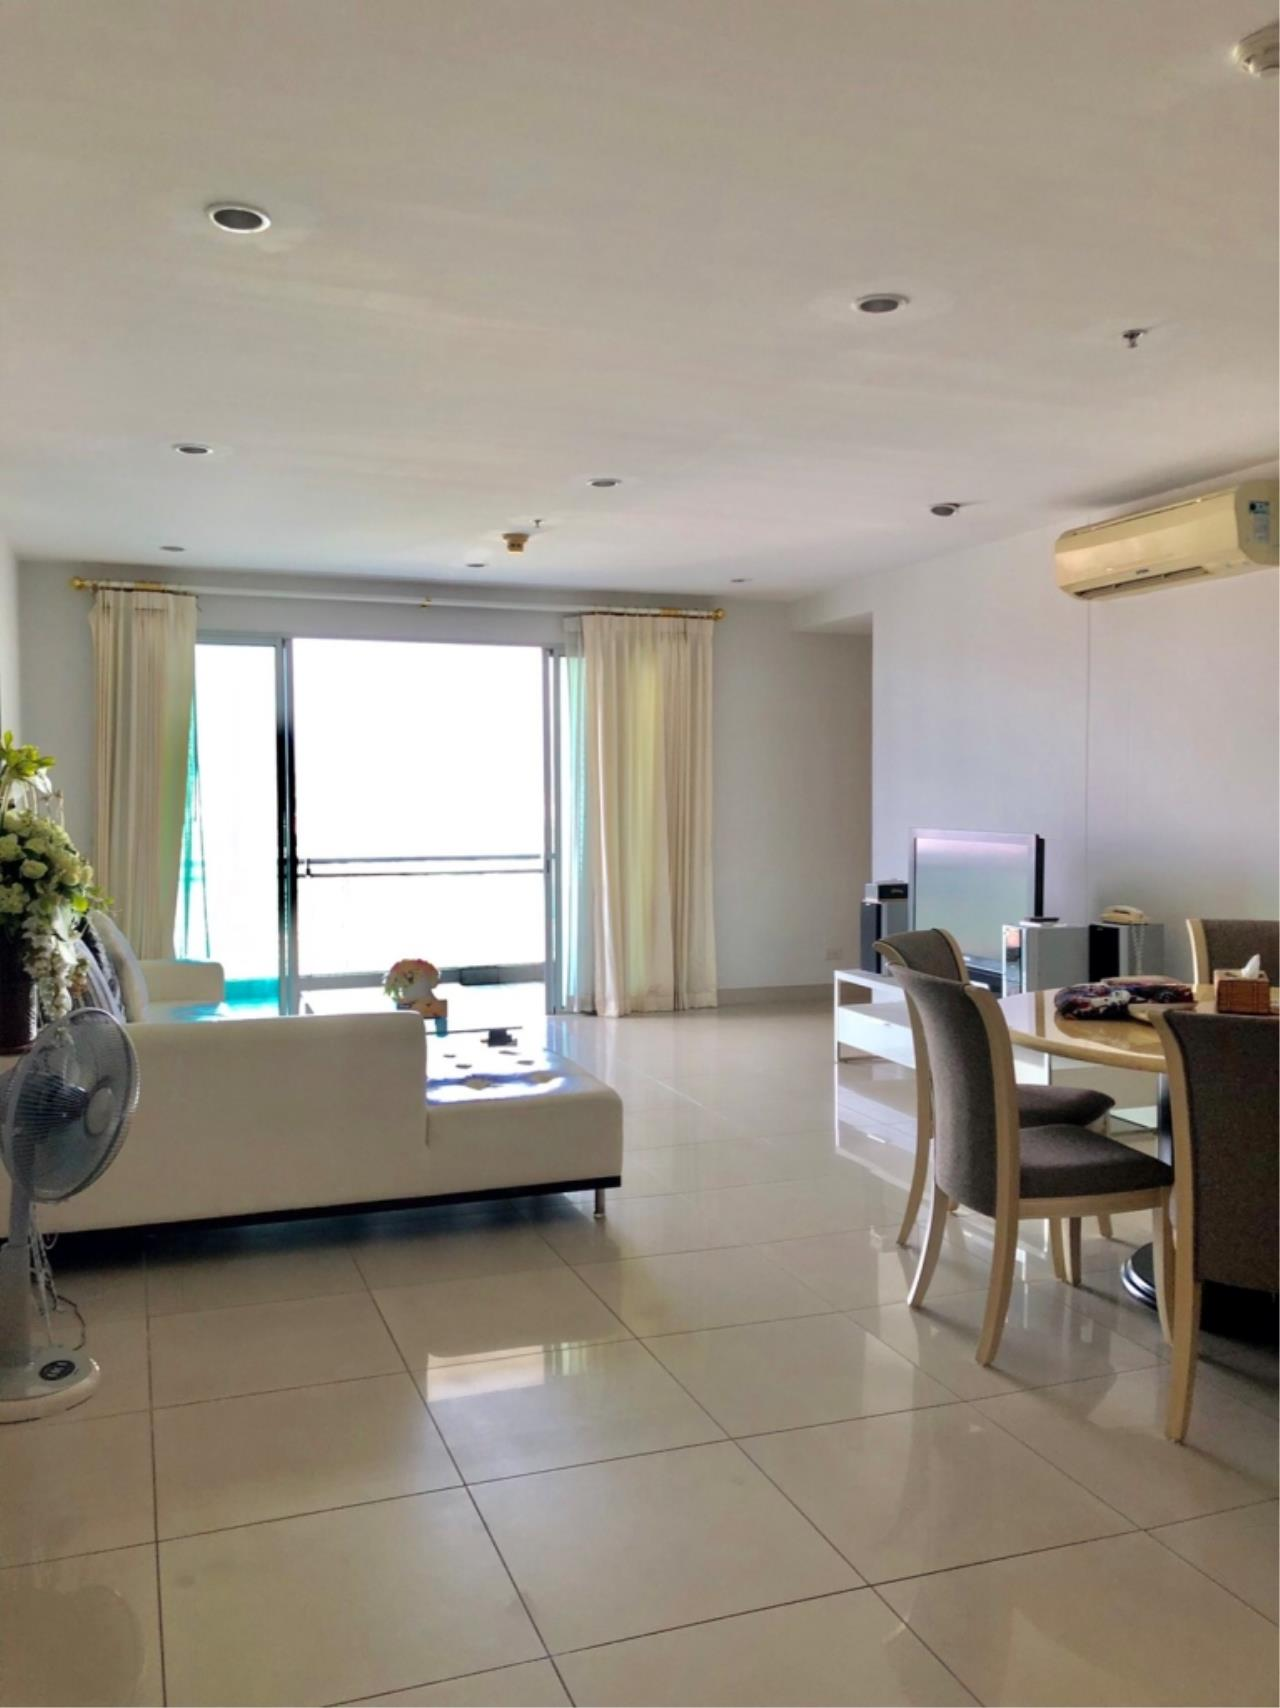 Century21 Skylux Agency's The Star Estate @ Narathiwas / Condo For Sale / 3 Bedroom / 165.34 SQM / BTS Chong Nonsi / Bangkok 4